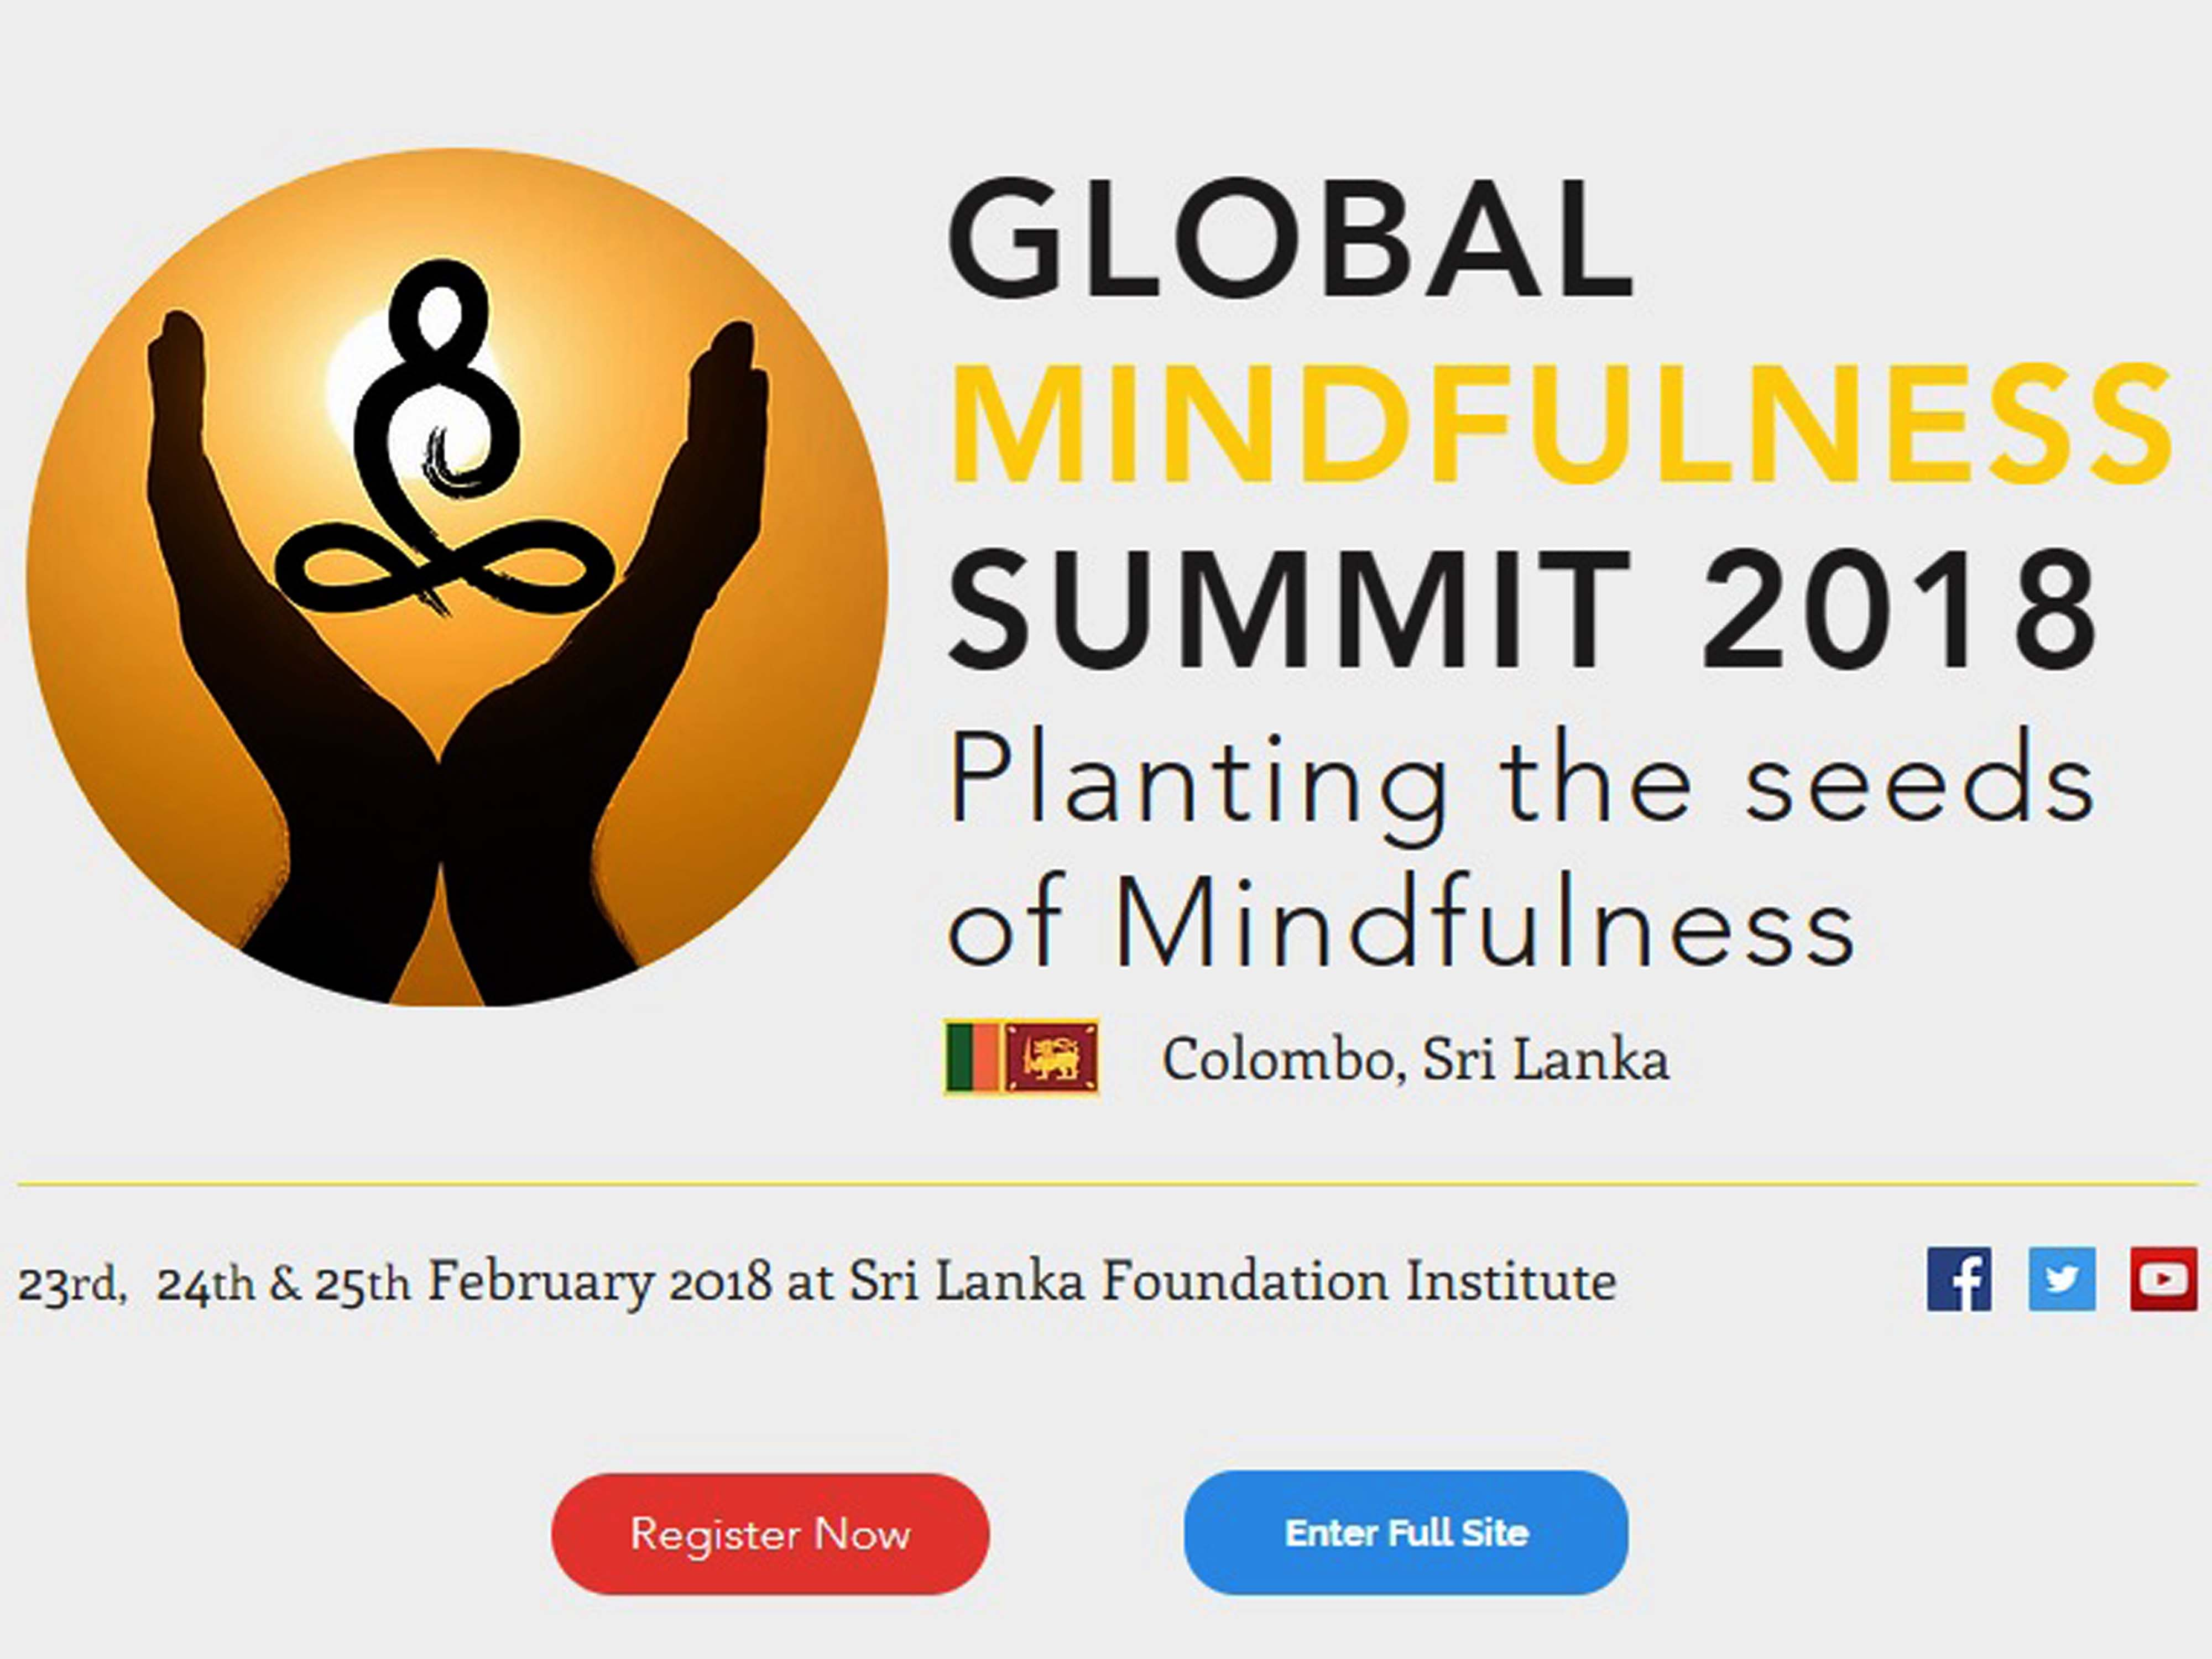 Global Mindfulness Summit